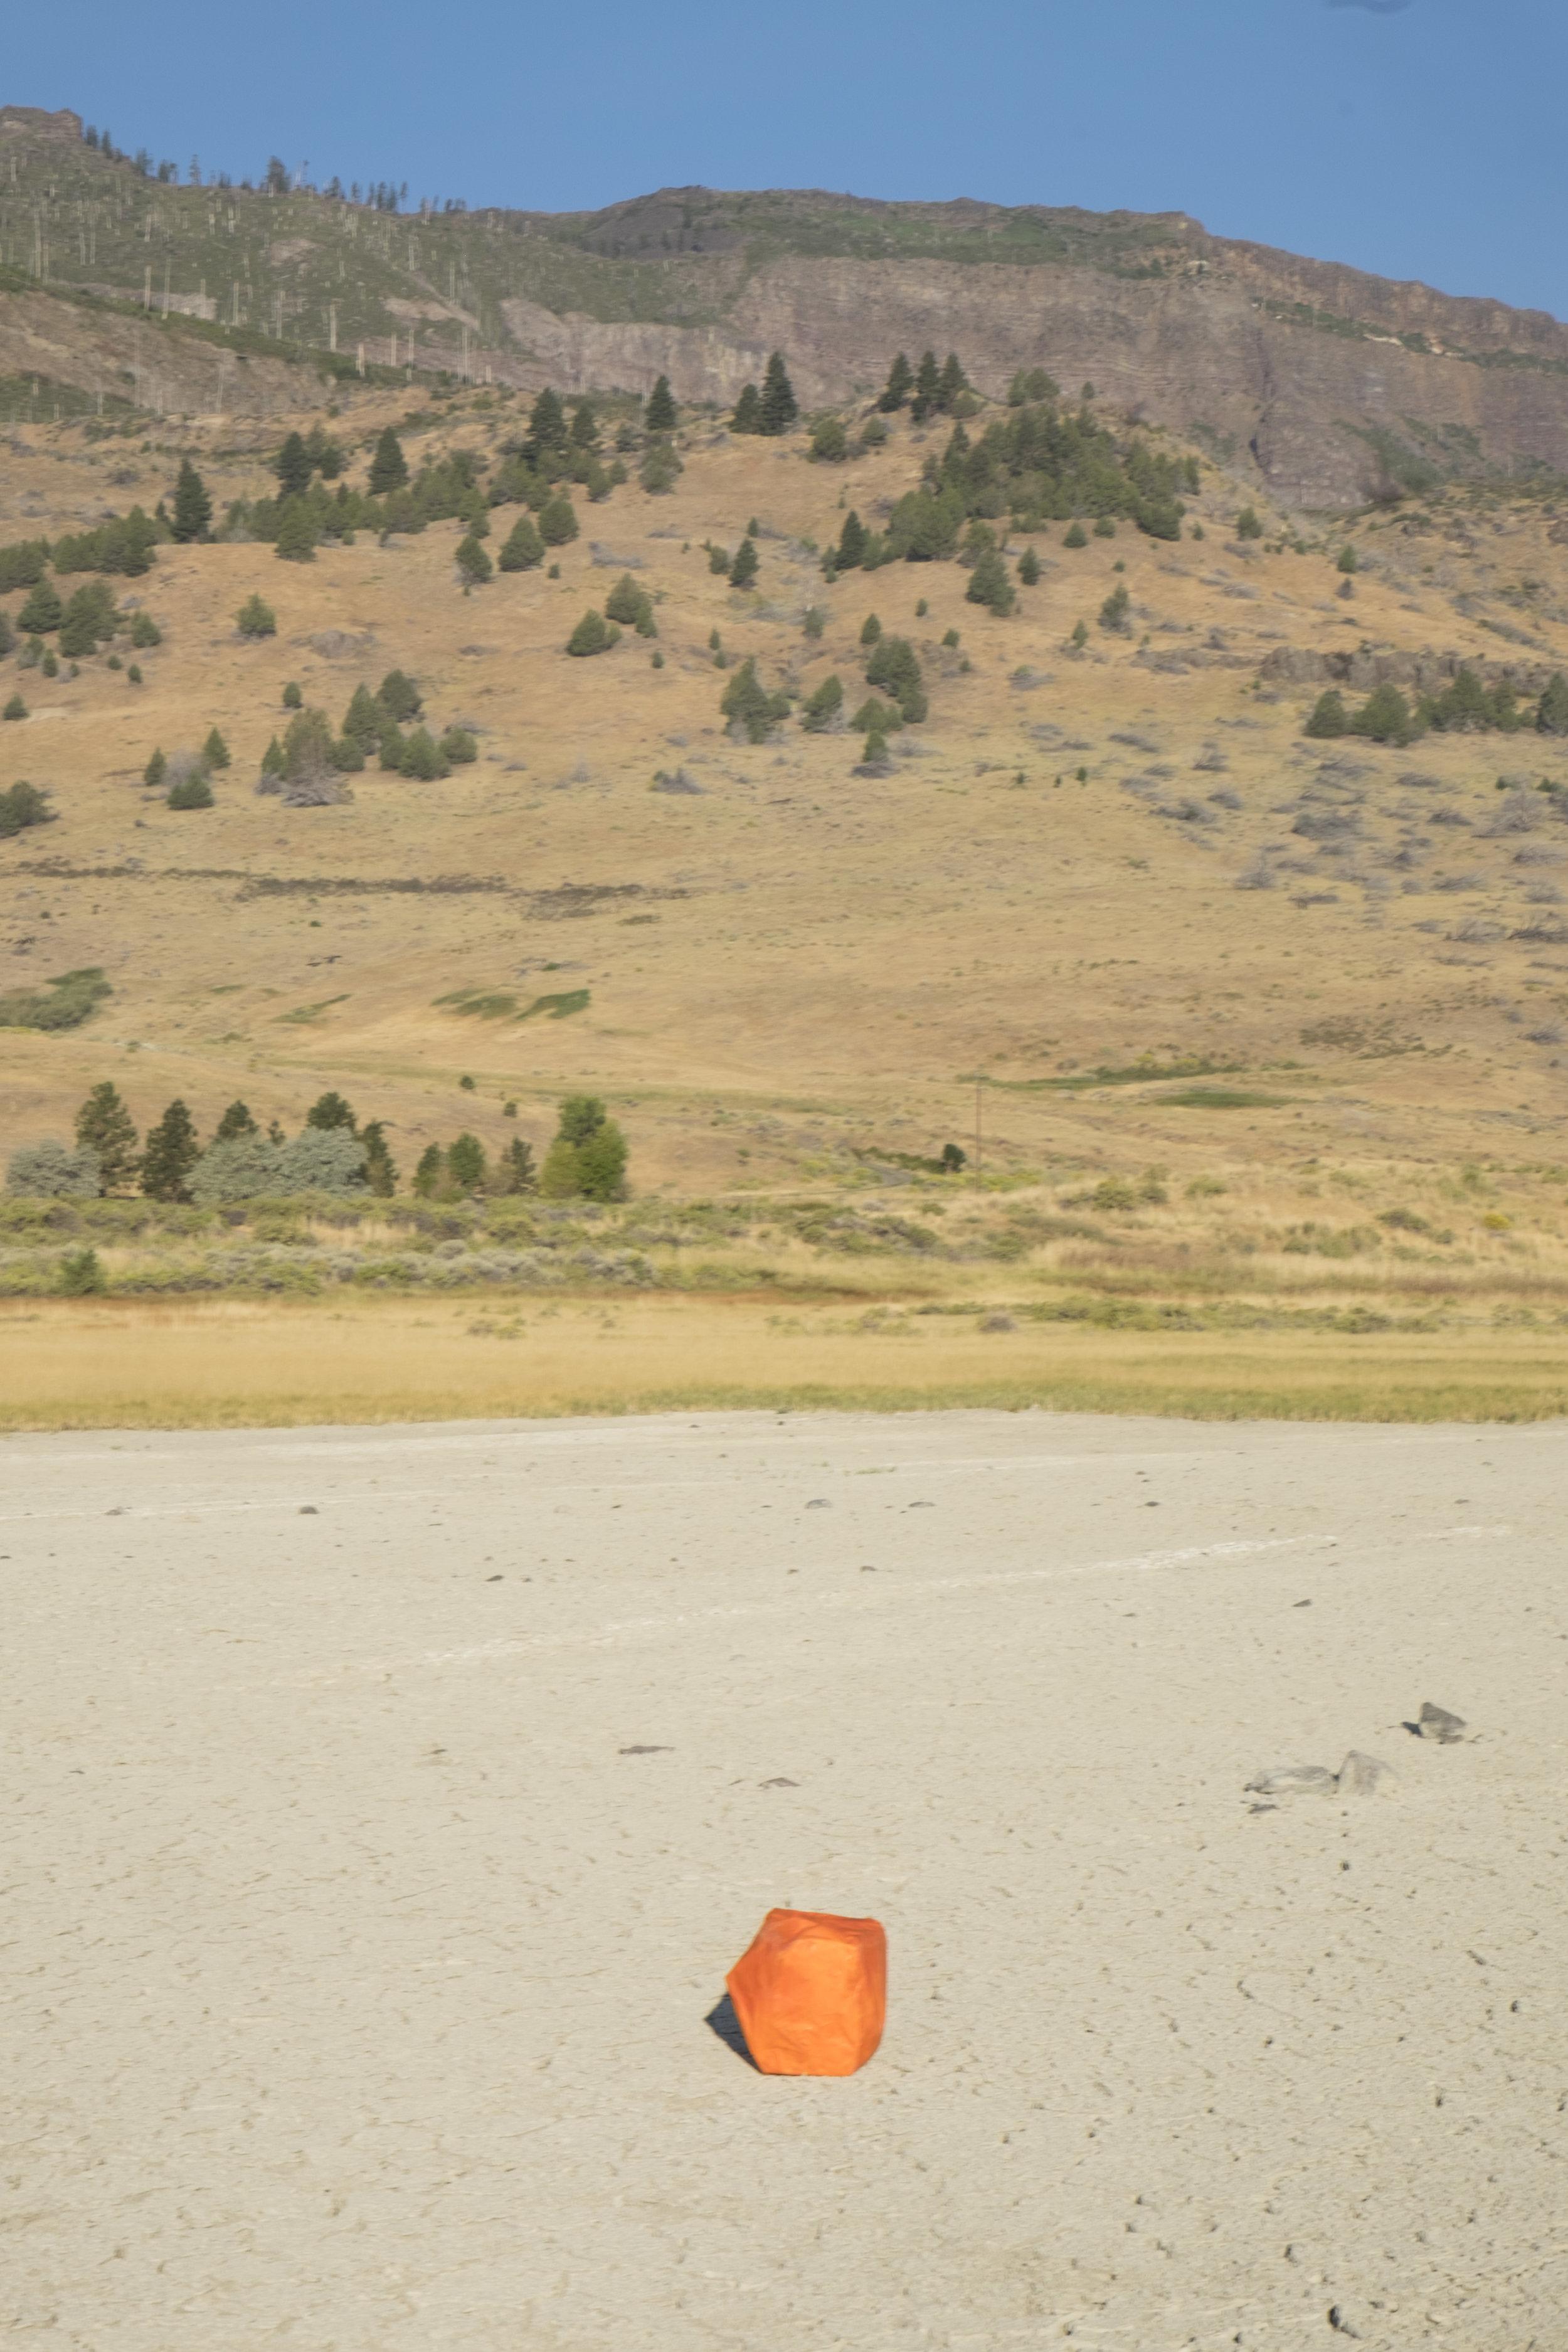 Rock Portrait (Orange with Mountains)